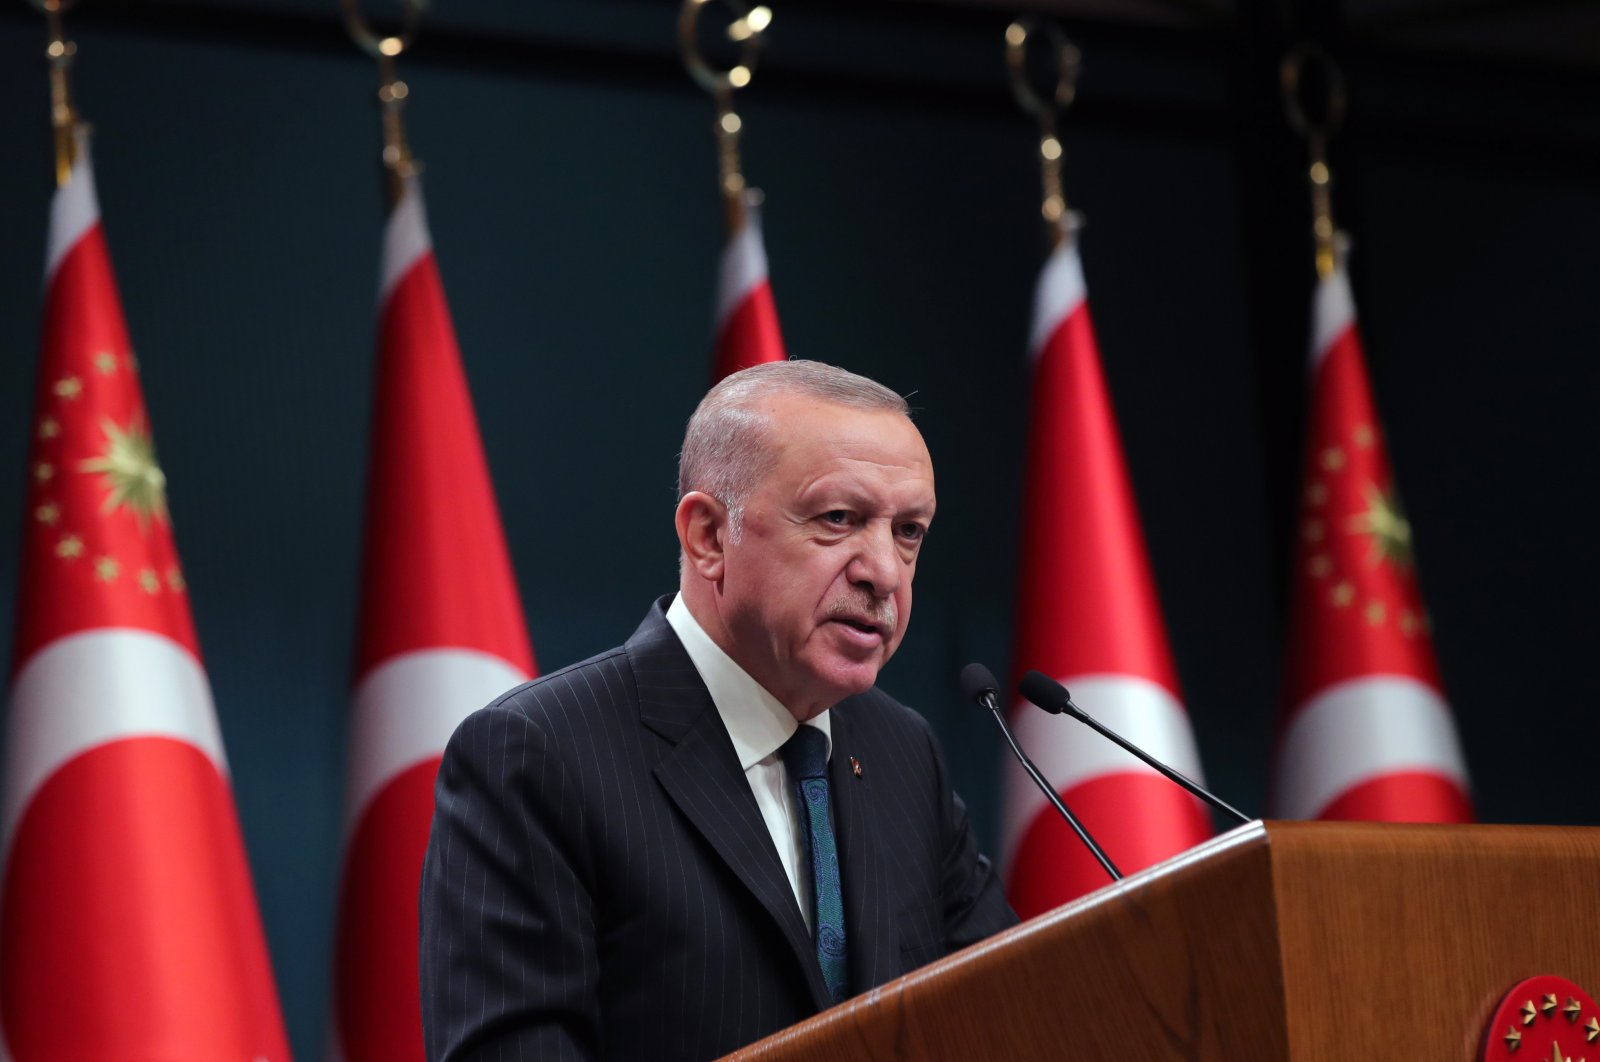 President Recep Tayyip Erdoğan speaks at the Presidential Complex, Ankara, Turkey, Sept. 7, 2021. (AA Photo)